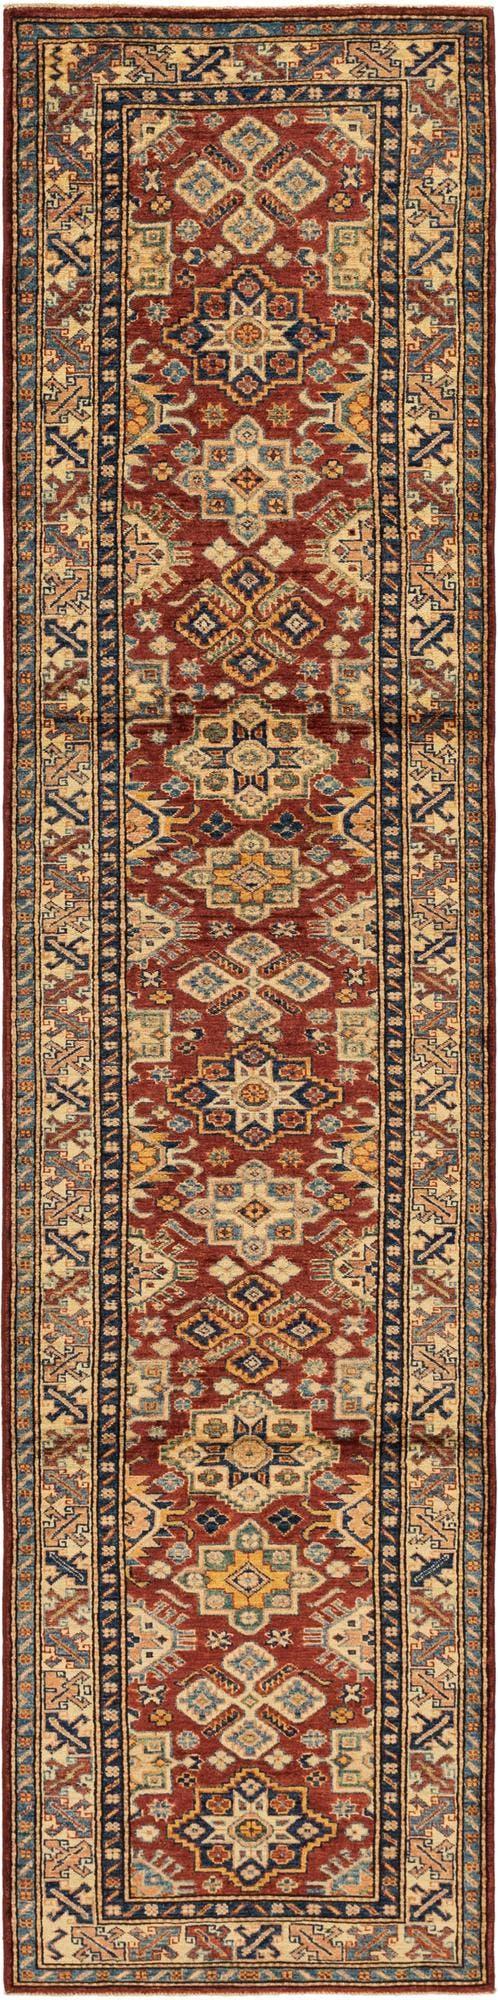 2' 9 x 11' 8 Kazak Oriental Round Rug main image